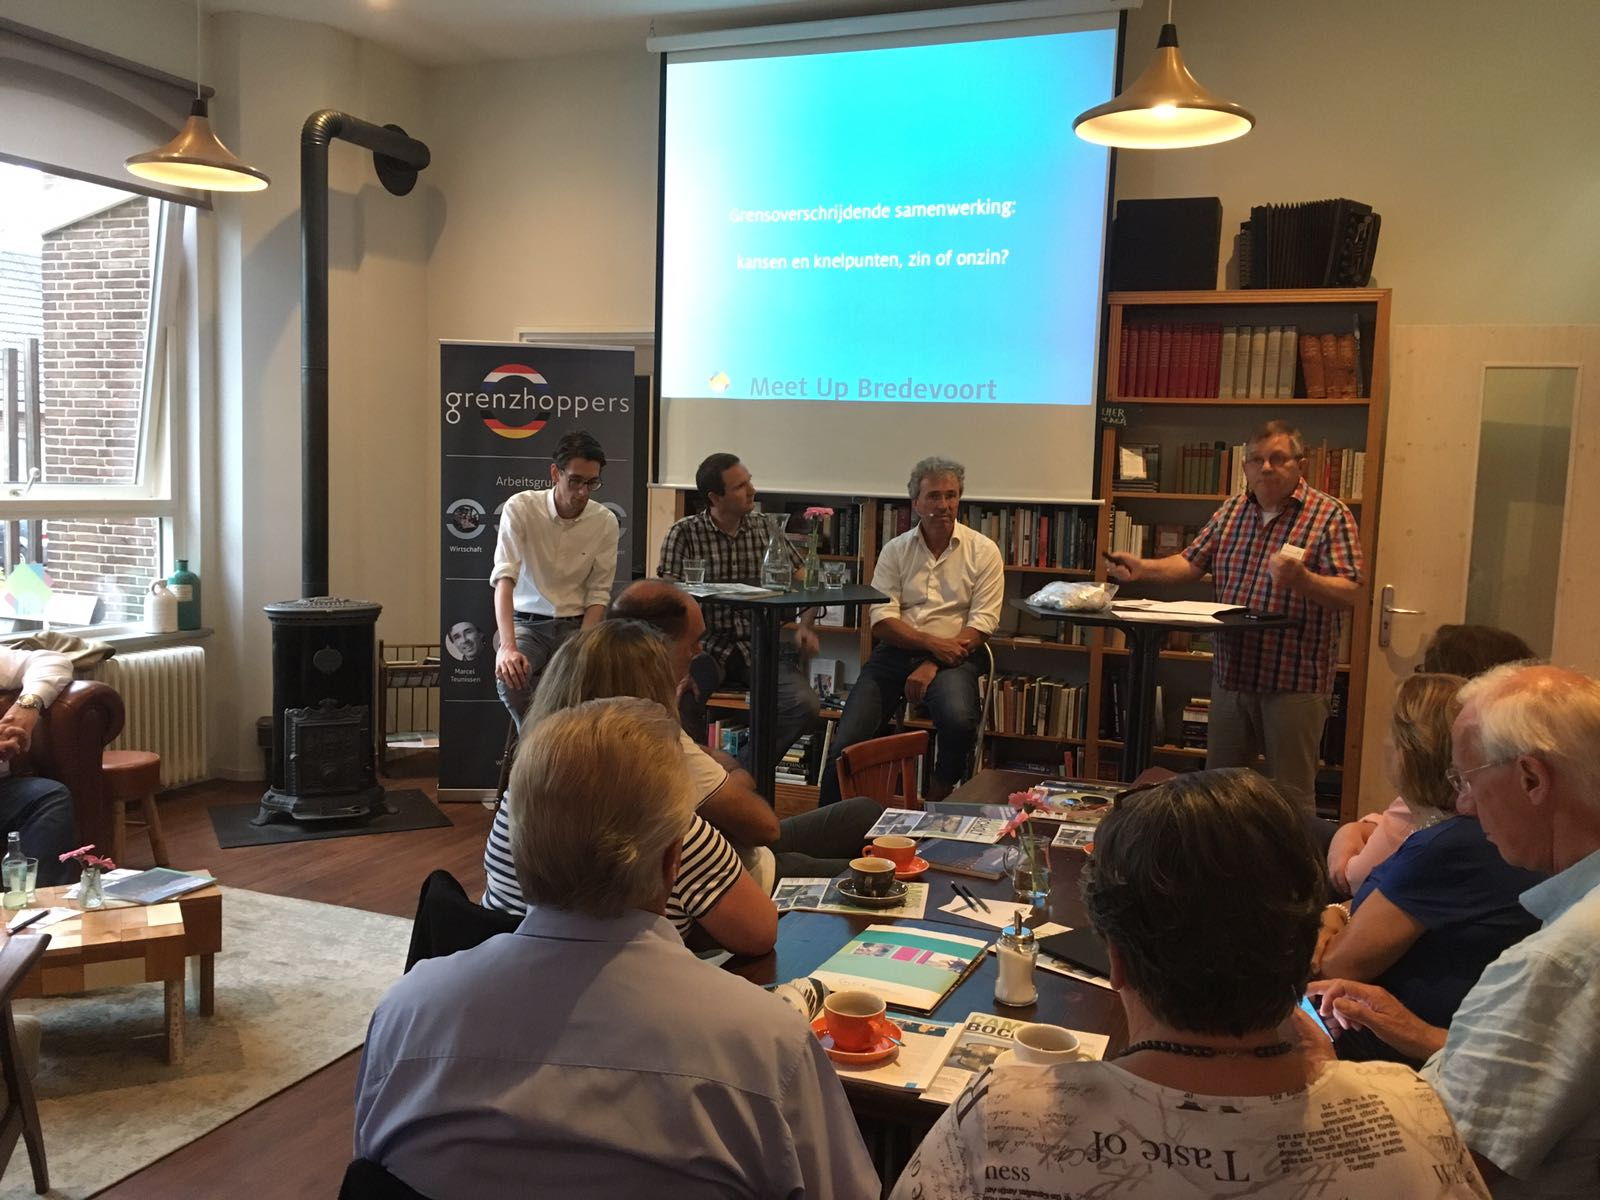 Meet up over grensoverschrijdende samenwerking